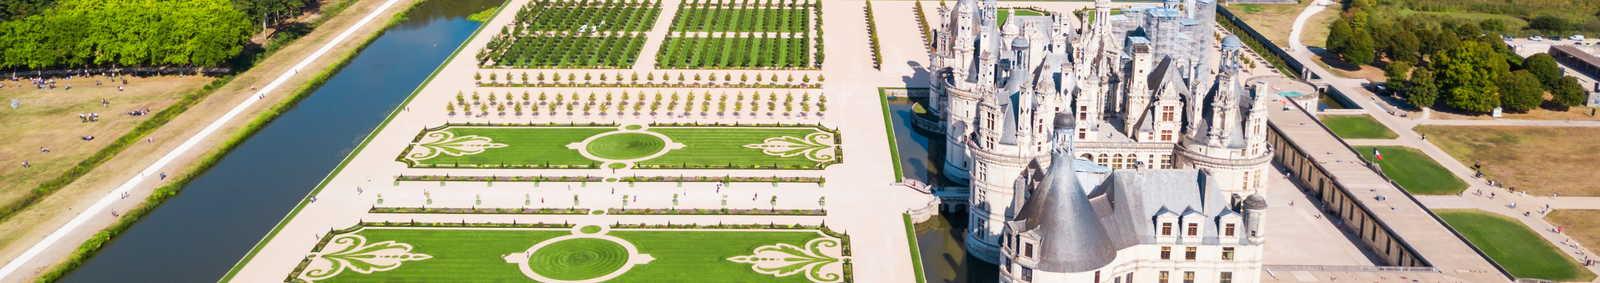 shutterstock_1260791887_-_chateau_de_chambord_gardens_aerial